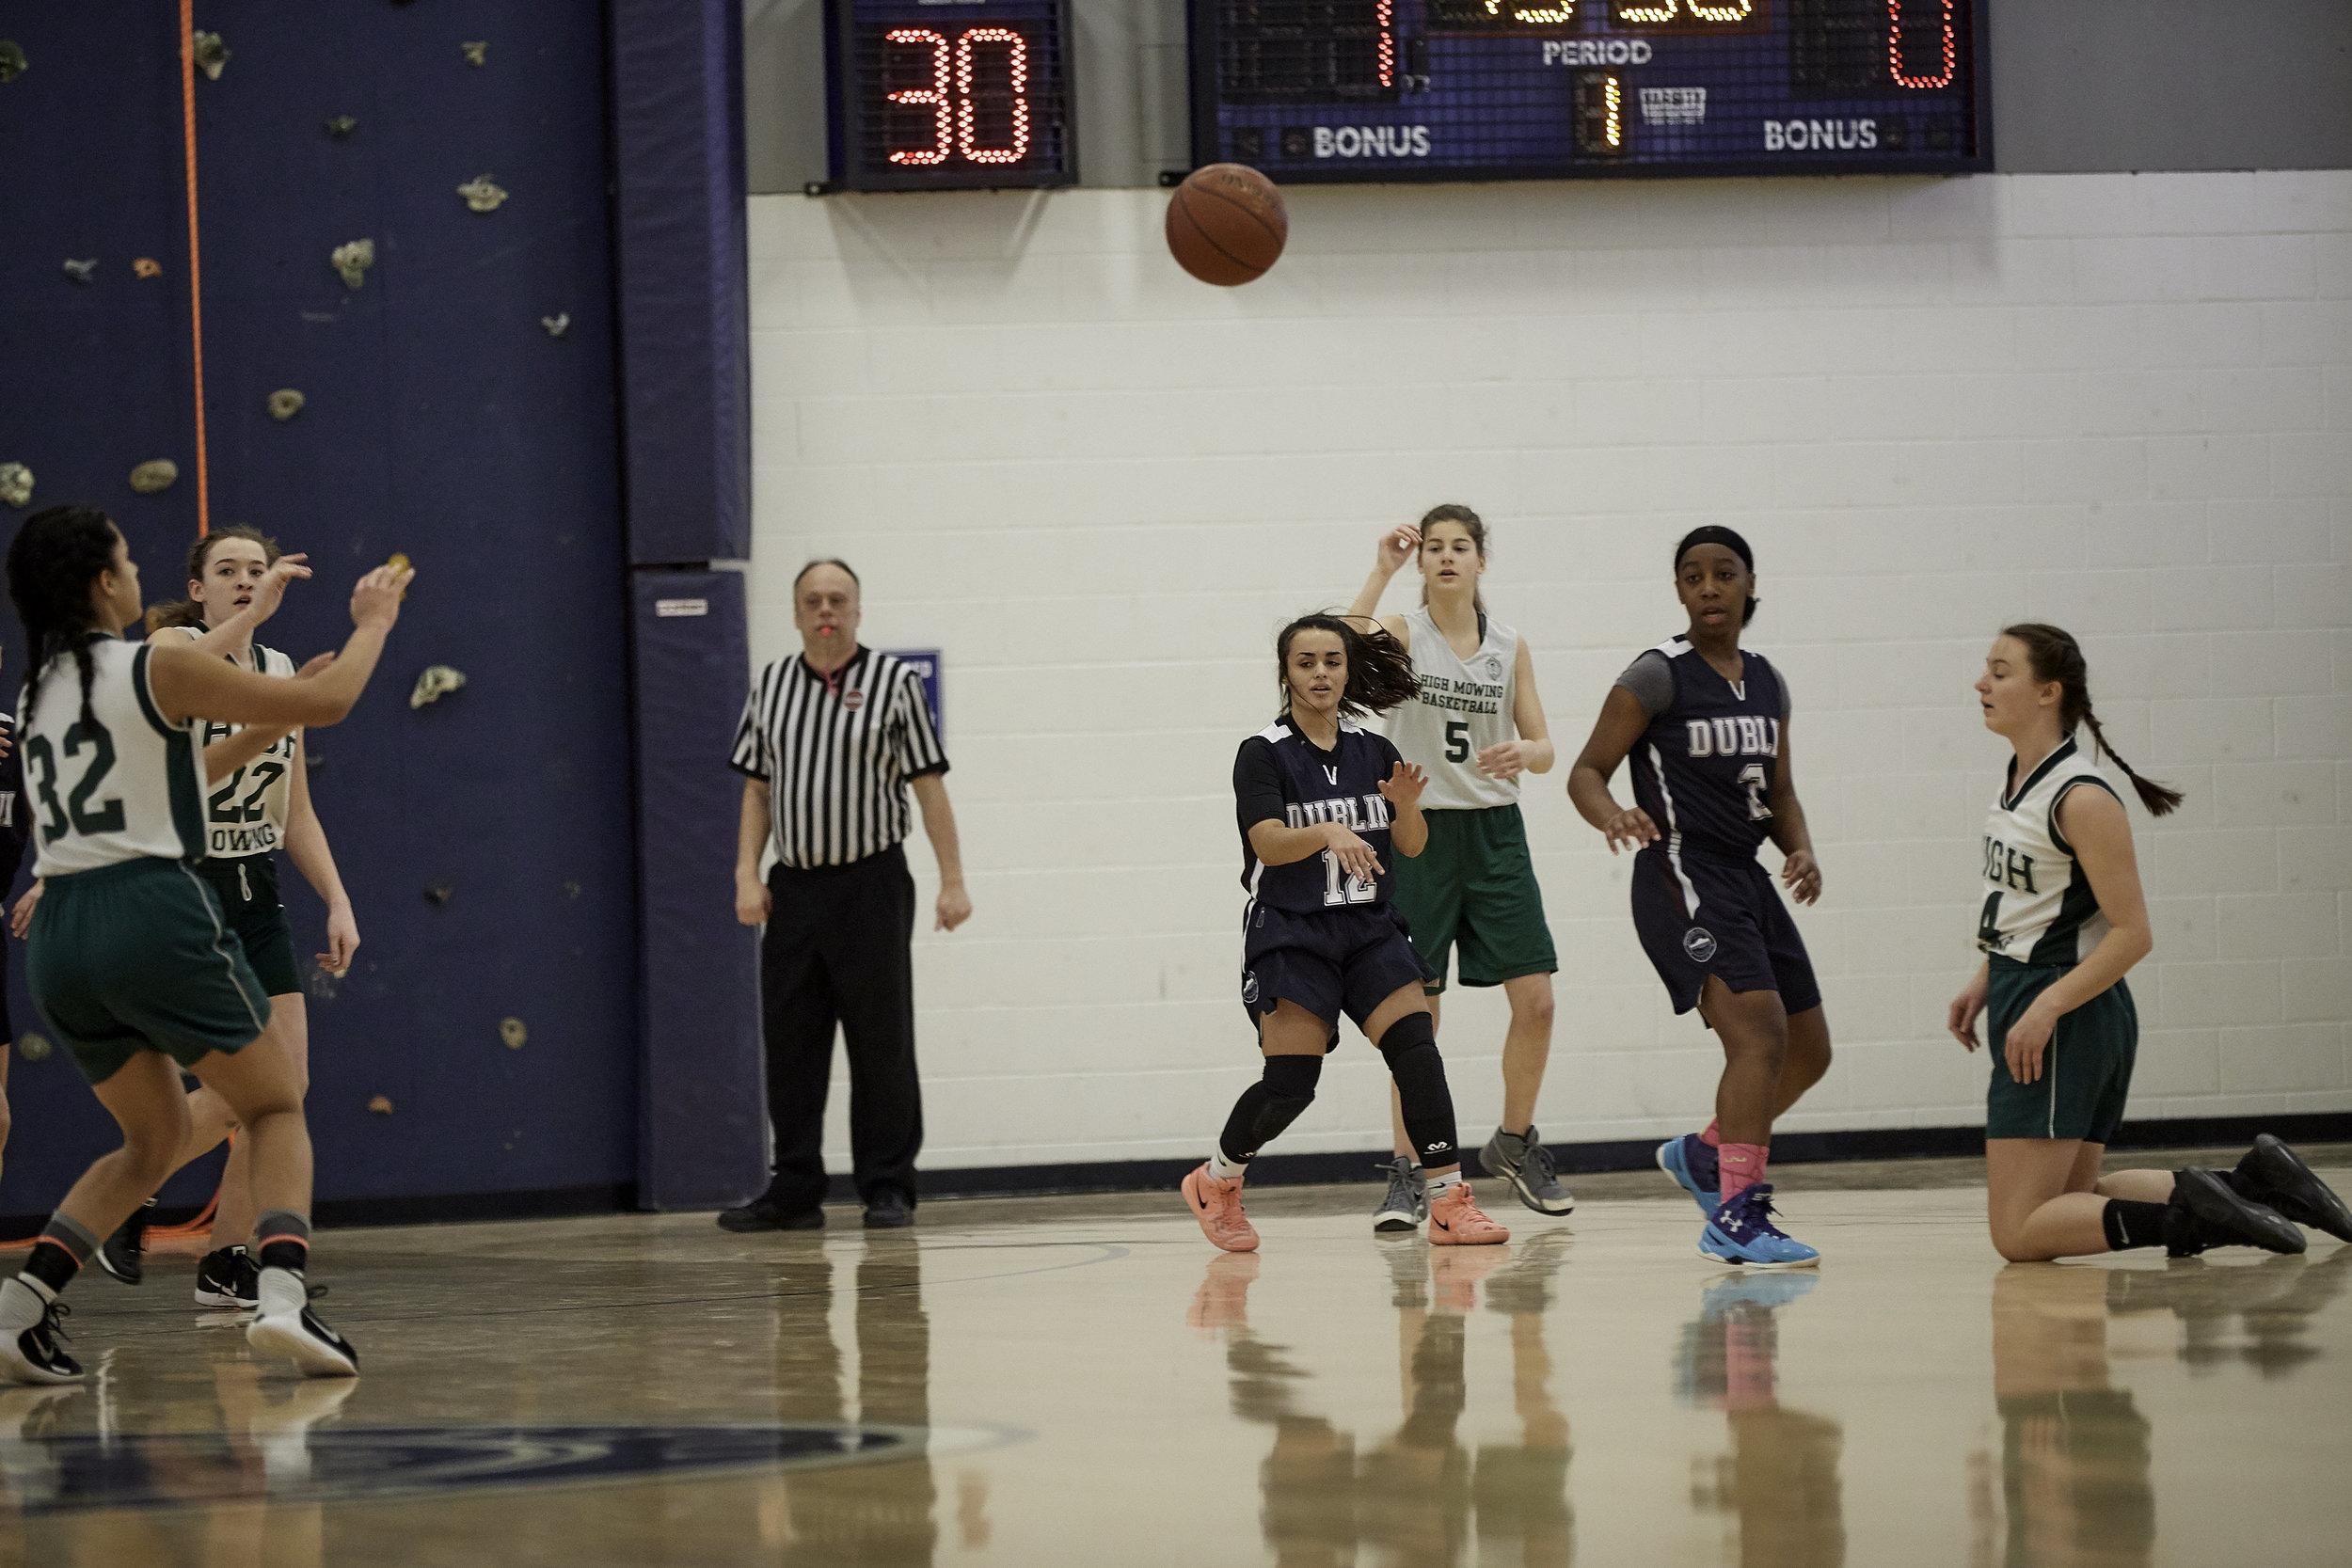 Basketball vs High Mowing School, February 2, 2019 - 166110.jpg